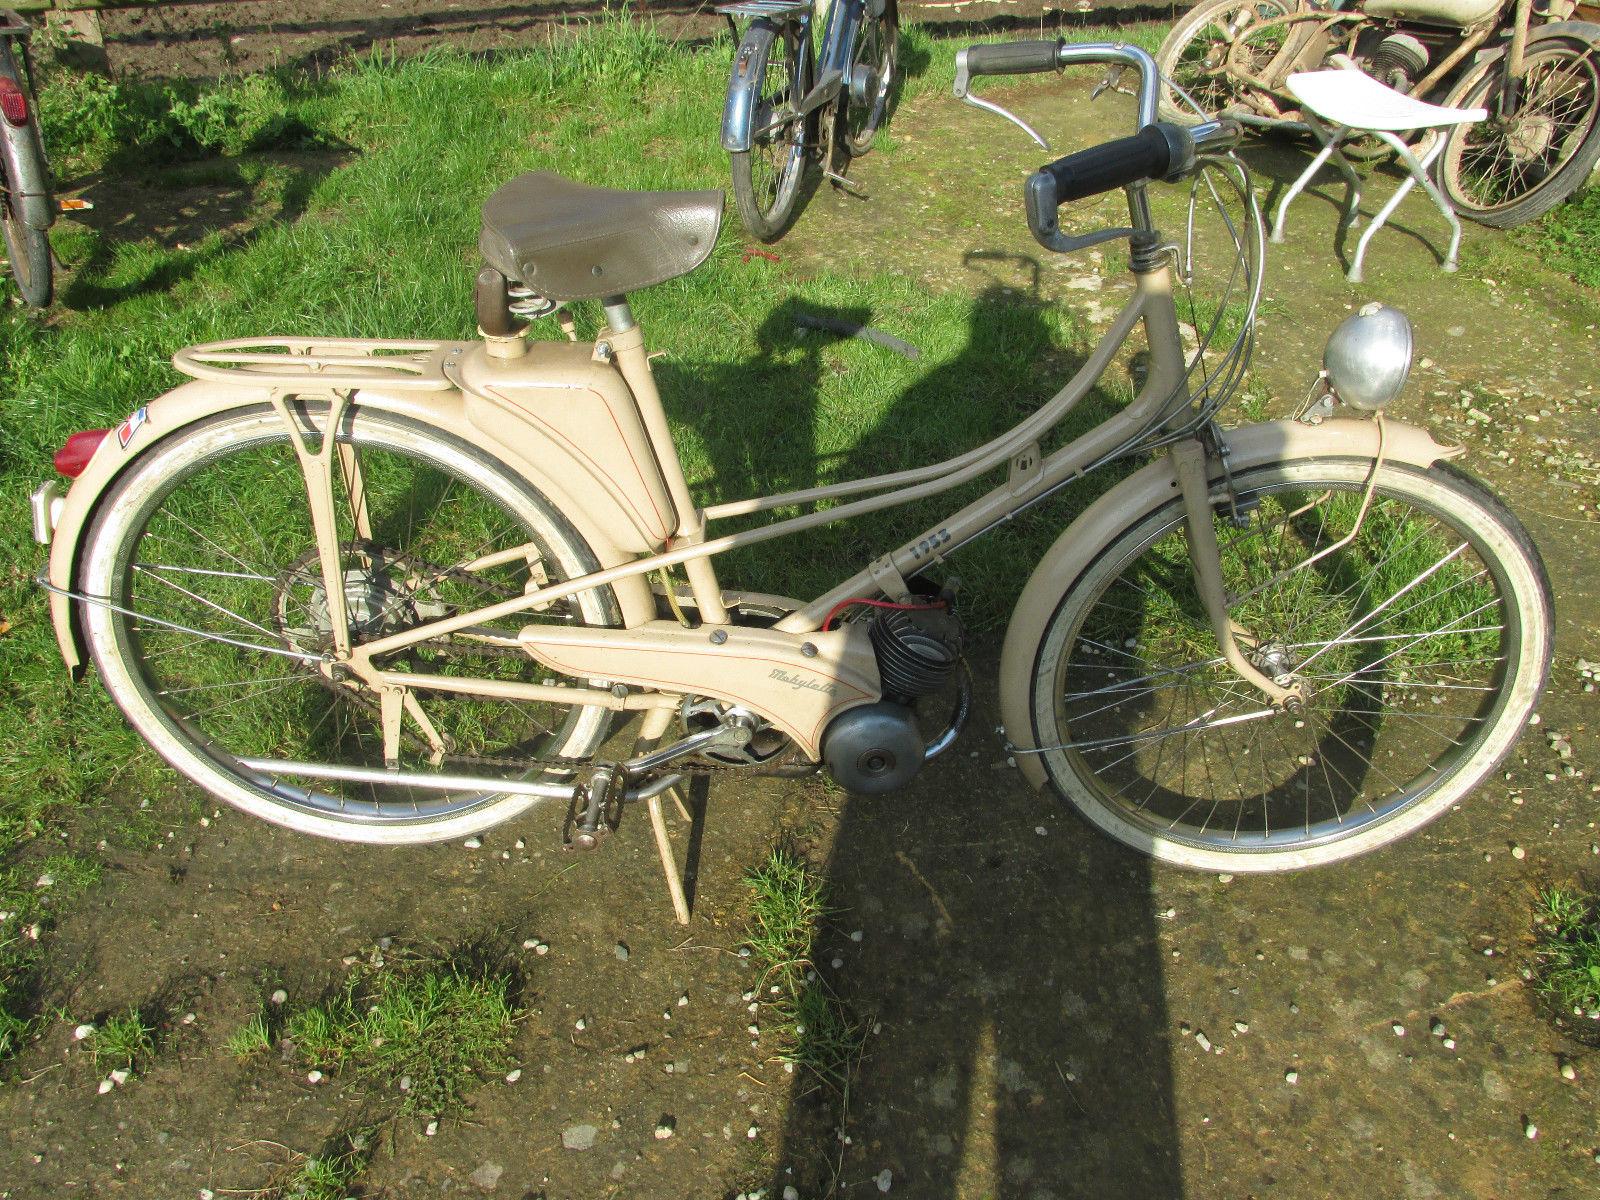 ex museum 1953 motobecane pantin mobylette velosolex french classic moped. Black Bedroom Furniture Sets. Home Design Ideas